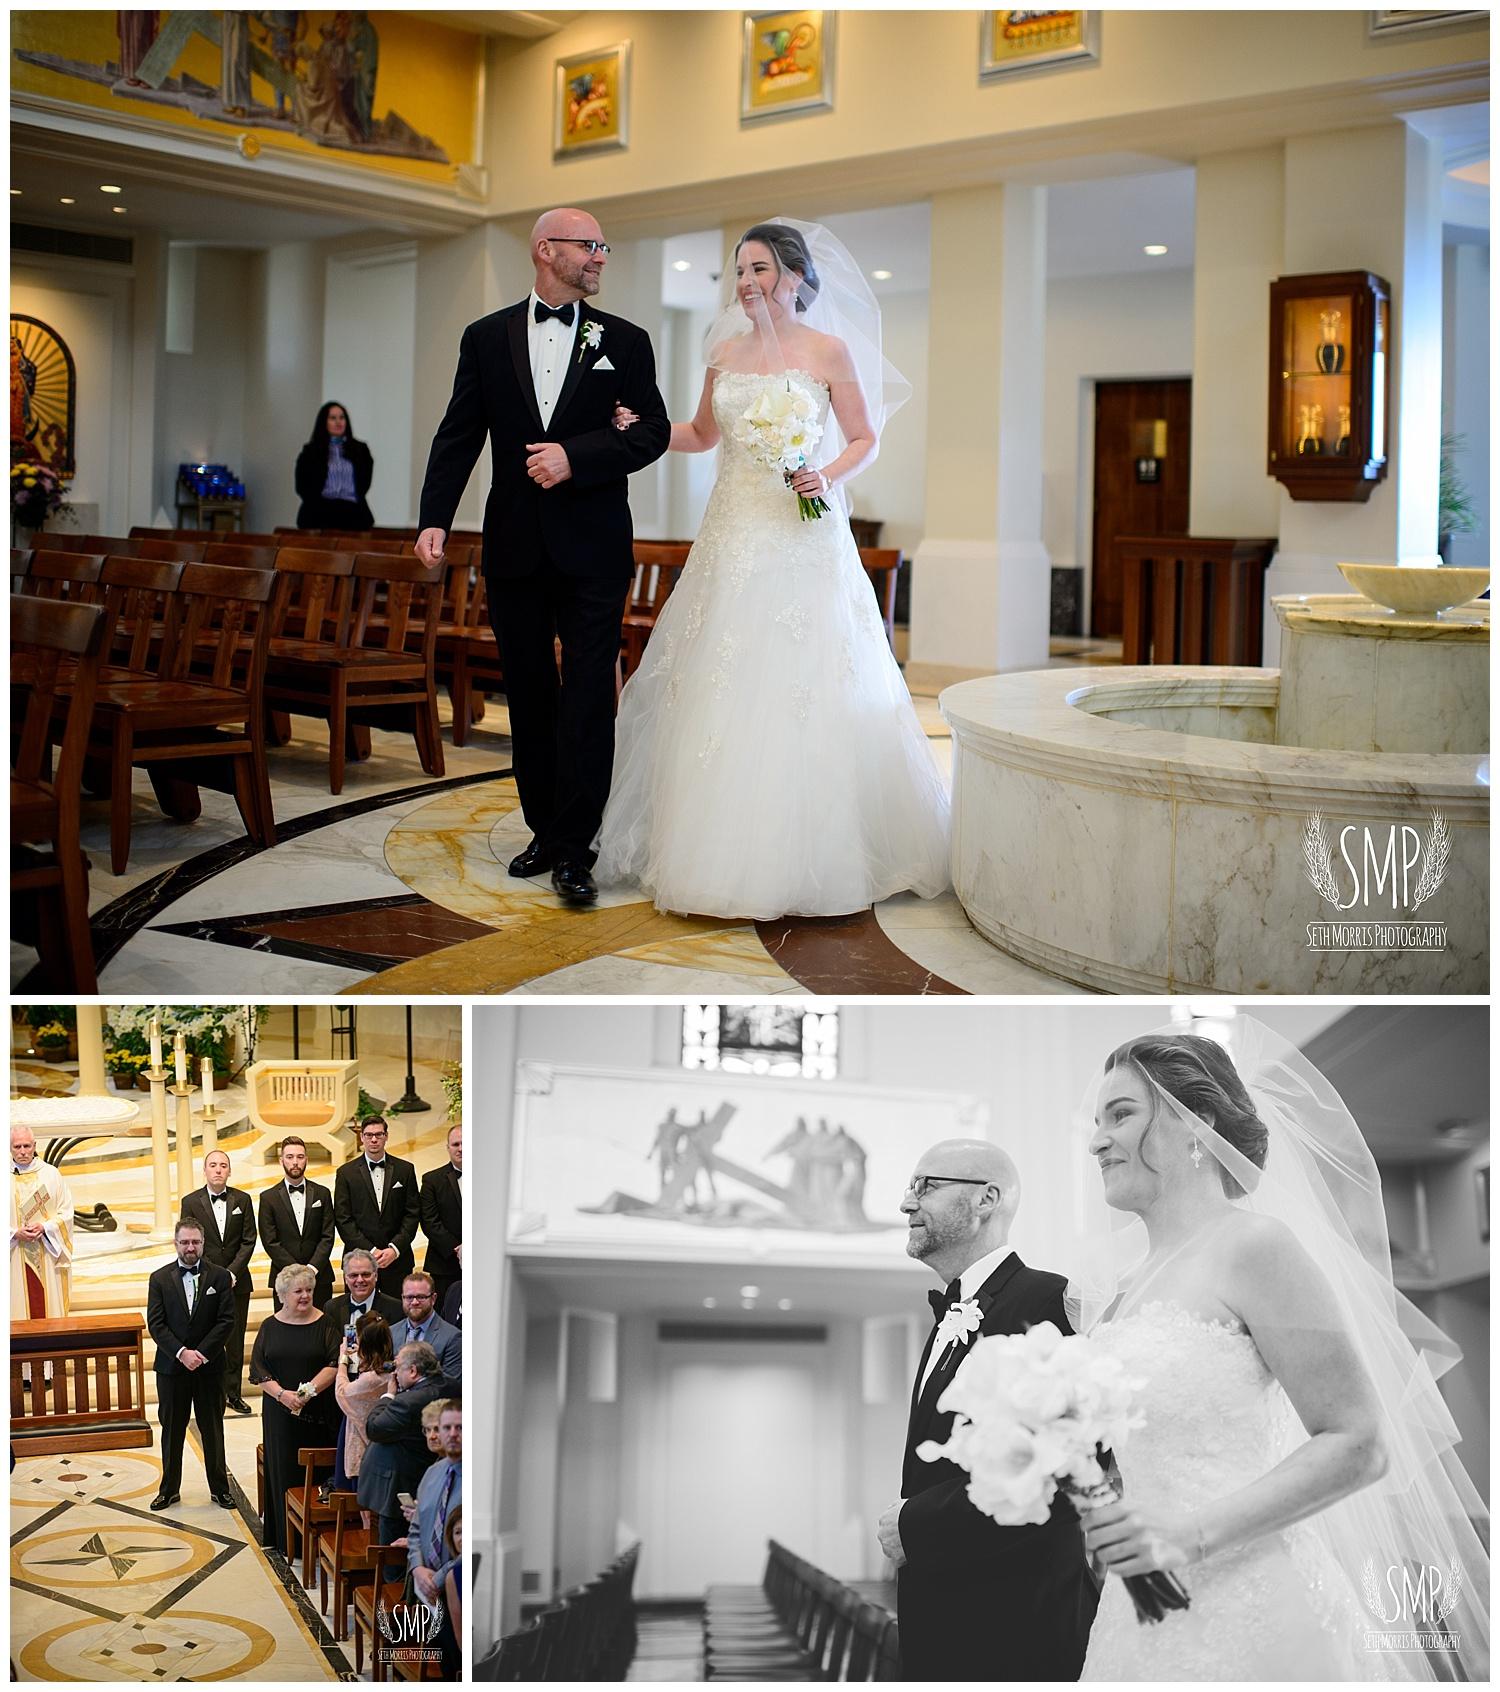 chicago-wedding-pictures-del-strada-hotel-allegro-47-1.jpg